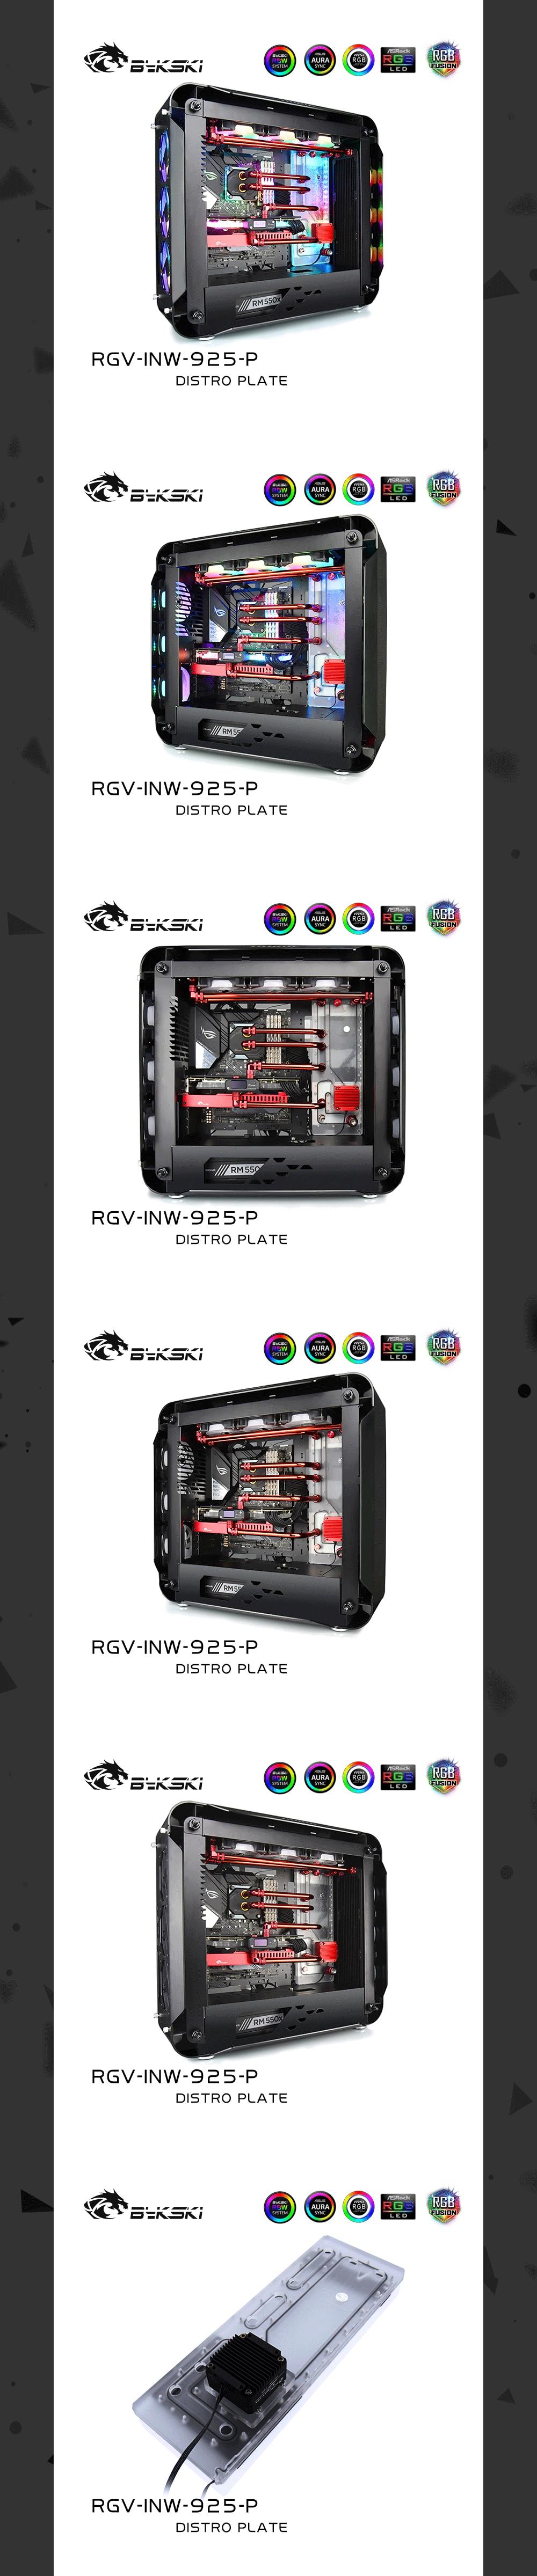 Bykski Waterway Cooling Kit For IN WIN 925 Case, 5V ARGB, For Single GPU Building, RGV-INW-925-P